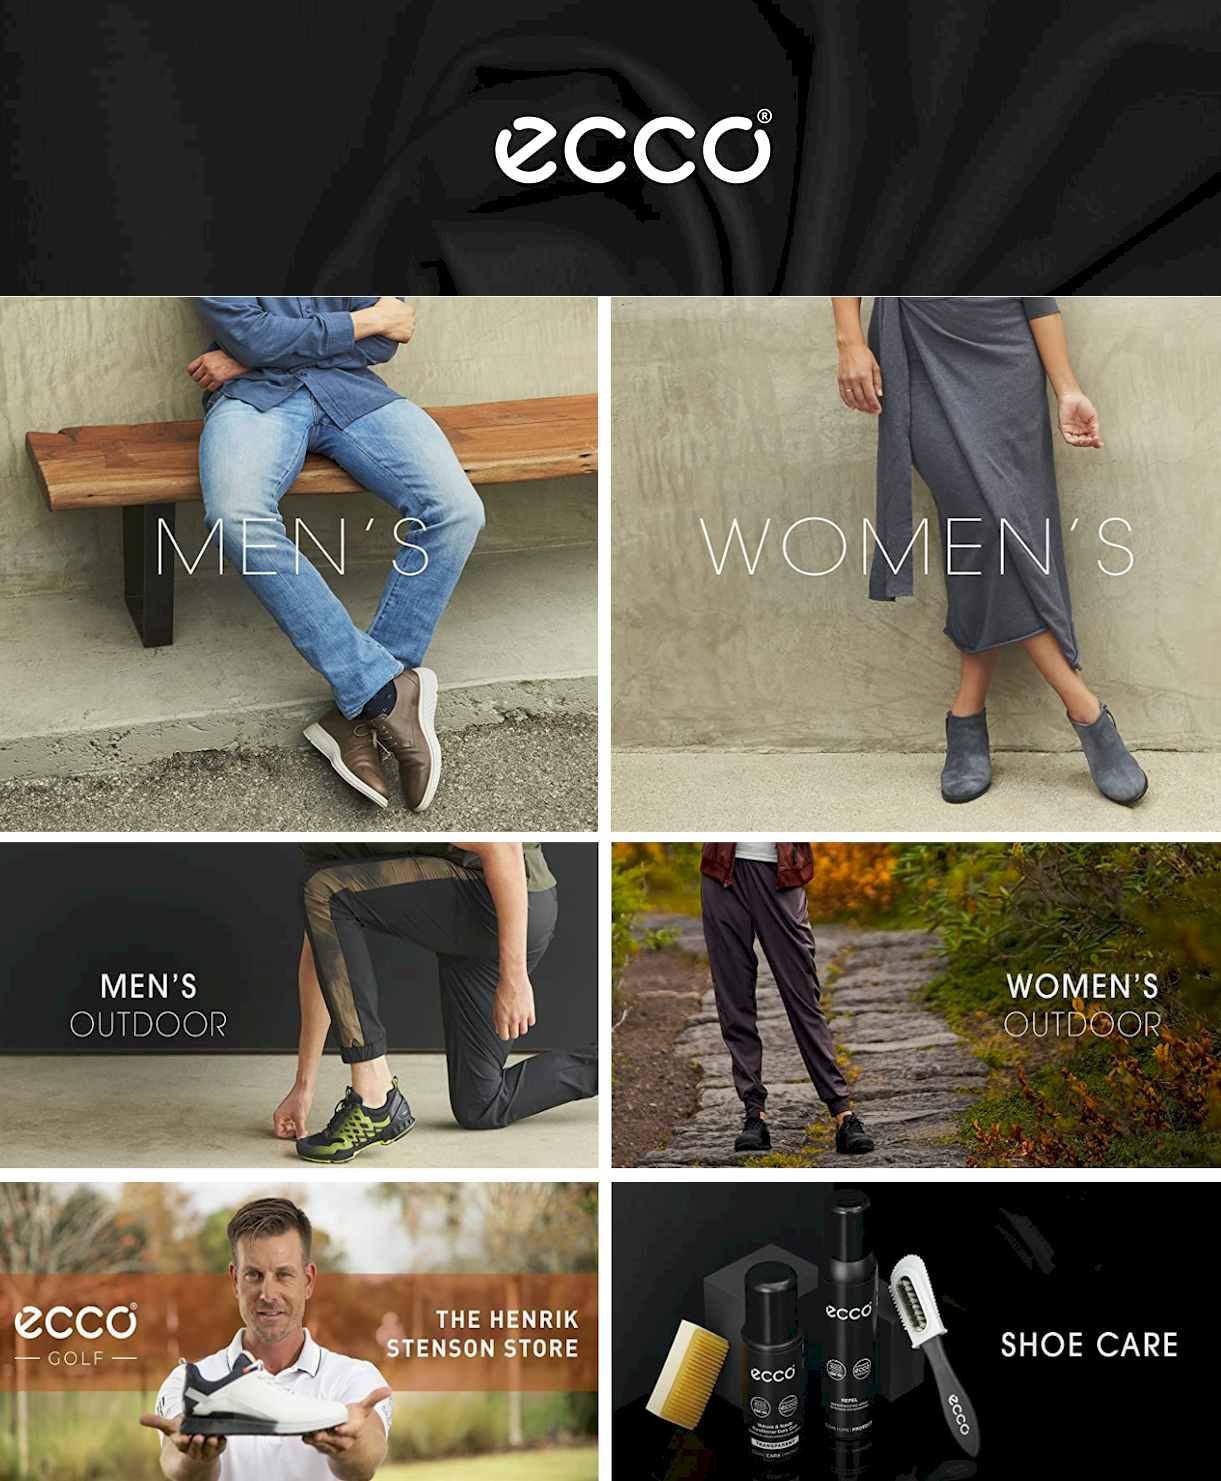 Ecco Hiking & Trekking Gear